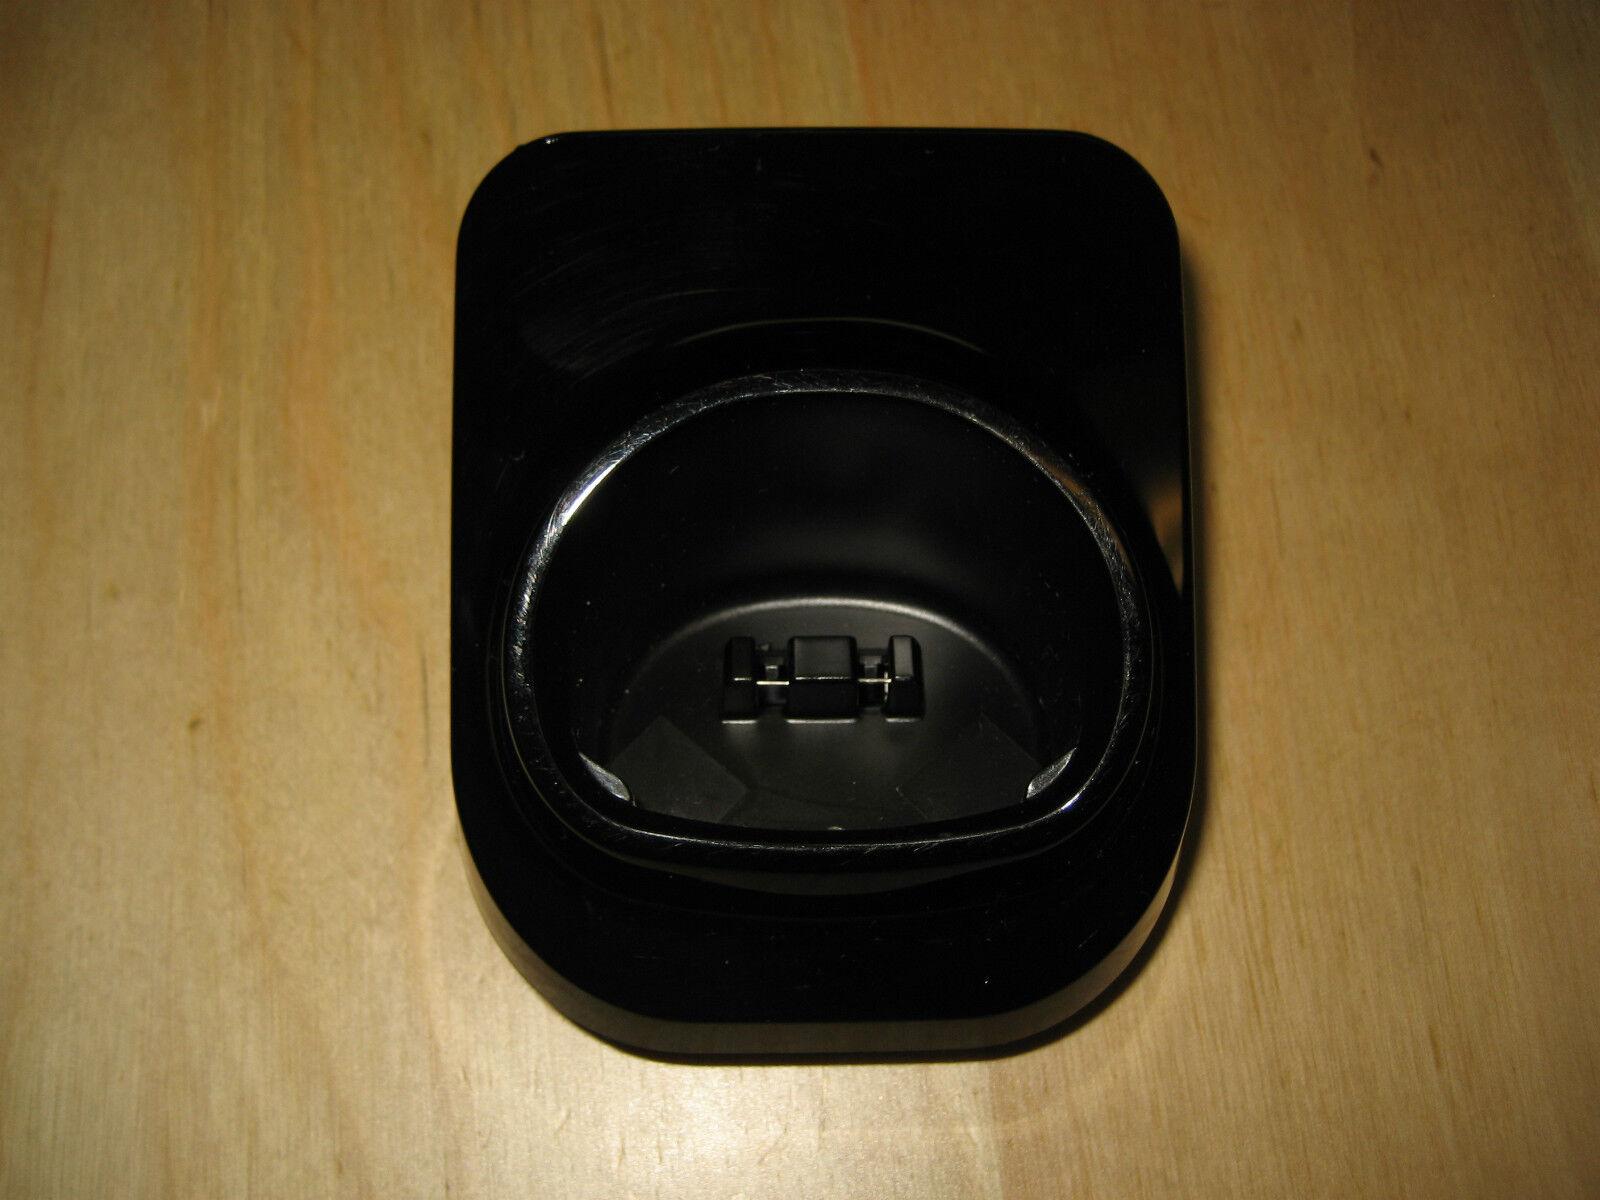 panasonic pnlc1007za phone handset charger with pqlv219 ac adaptor rh ebay com